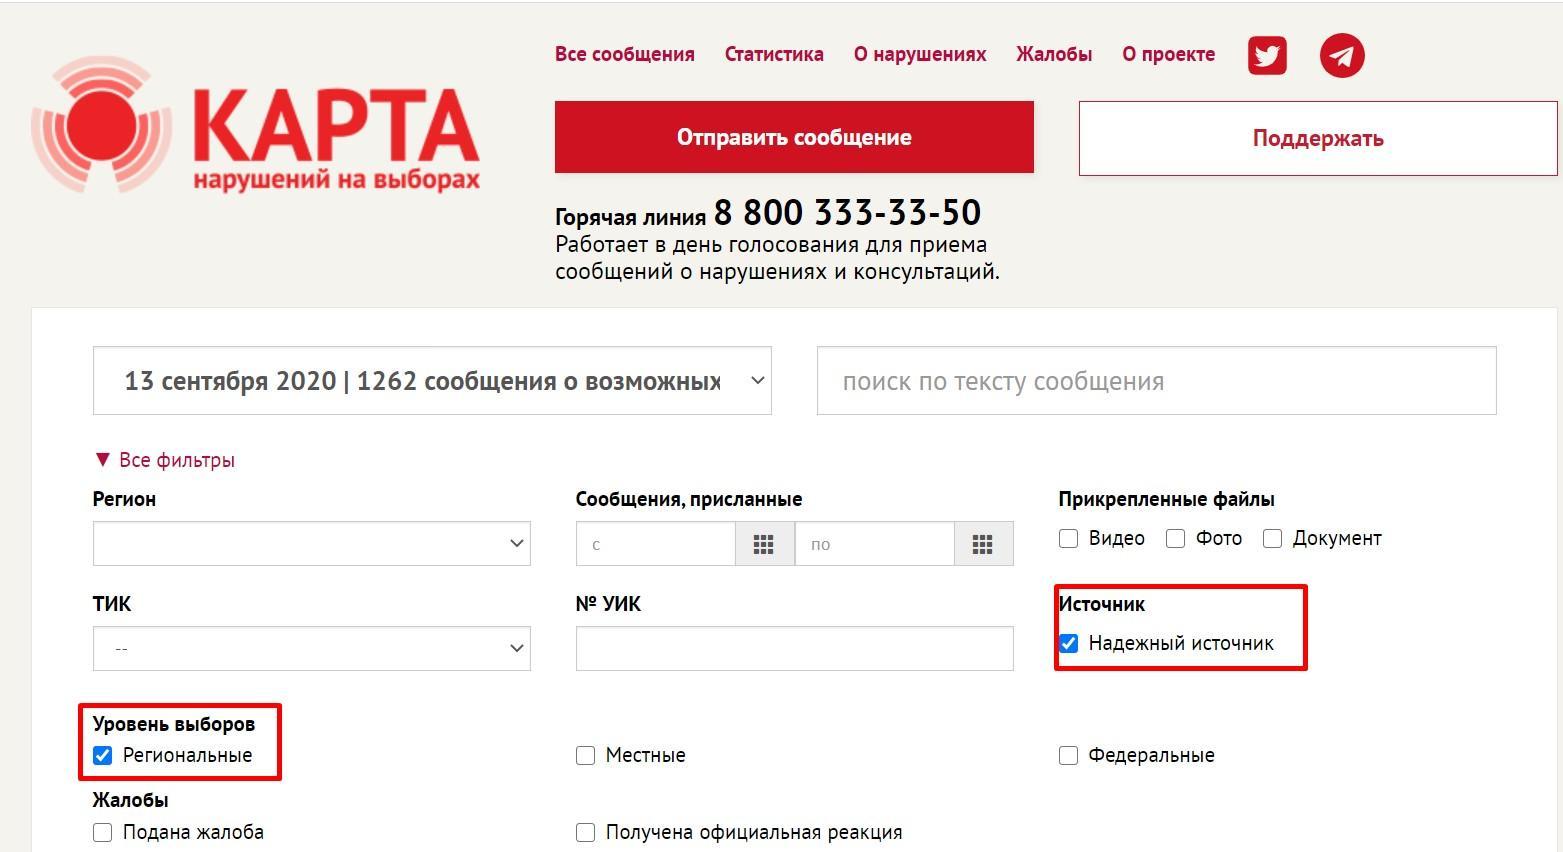 Скриншот сайта kartanarusheniy.org